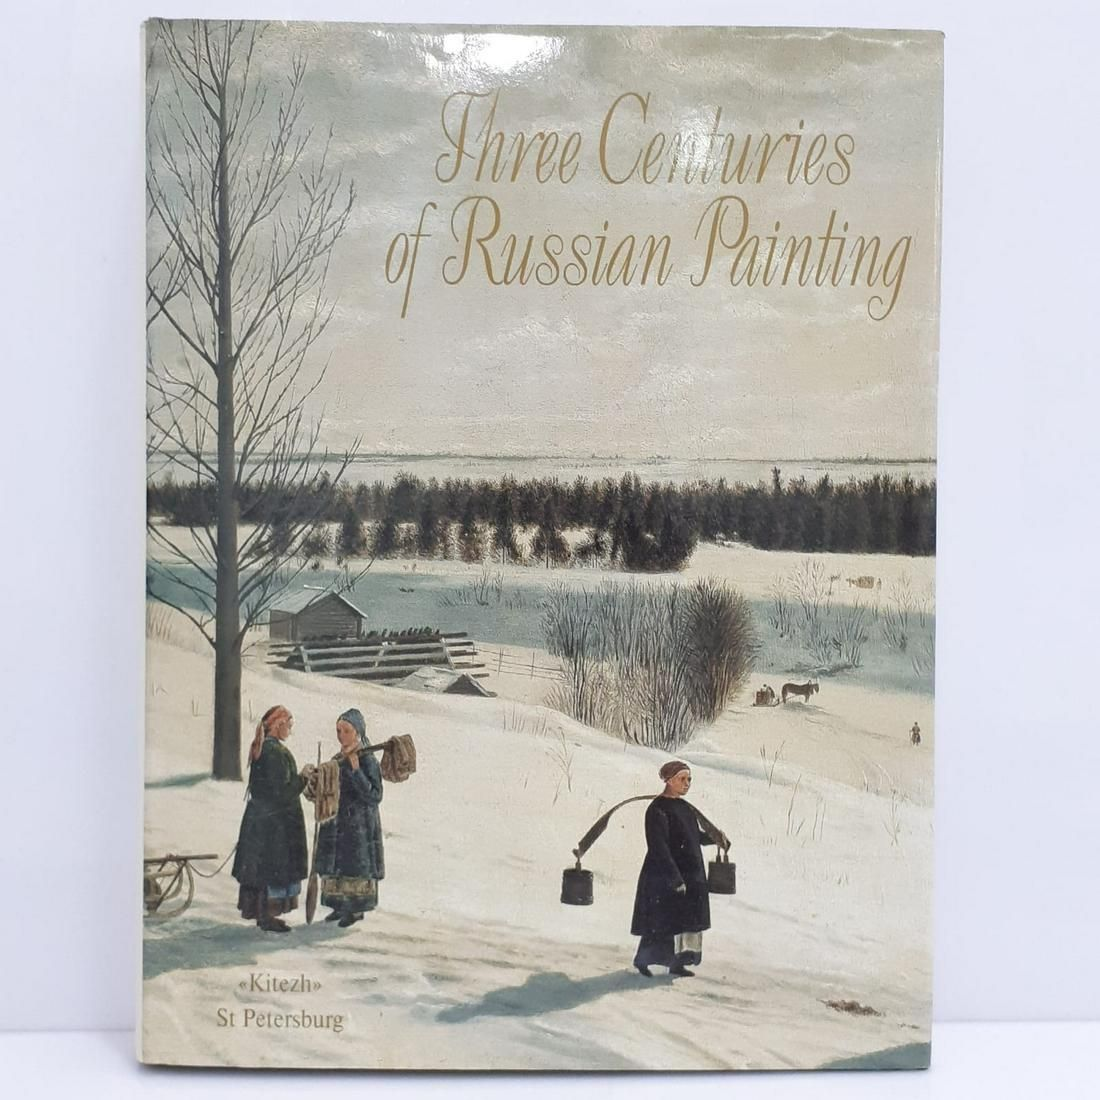 THREE CENTURIES OF RUSSIAN PAINTING